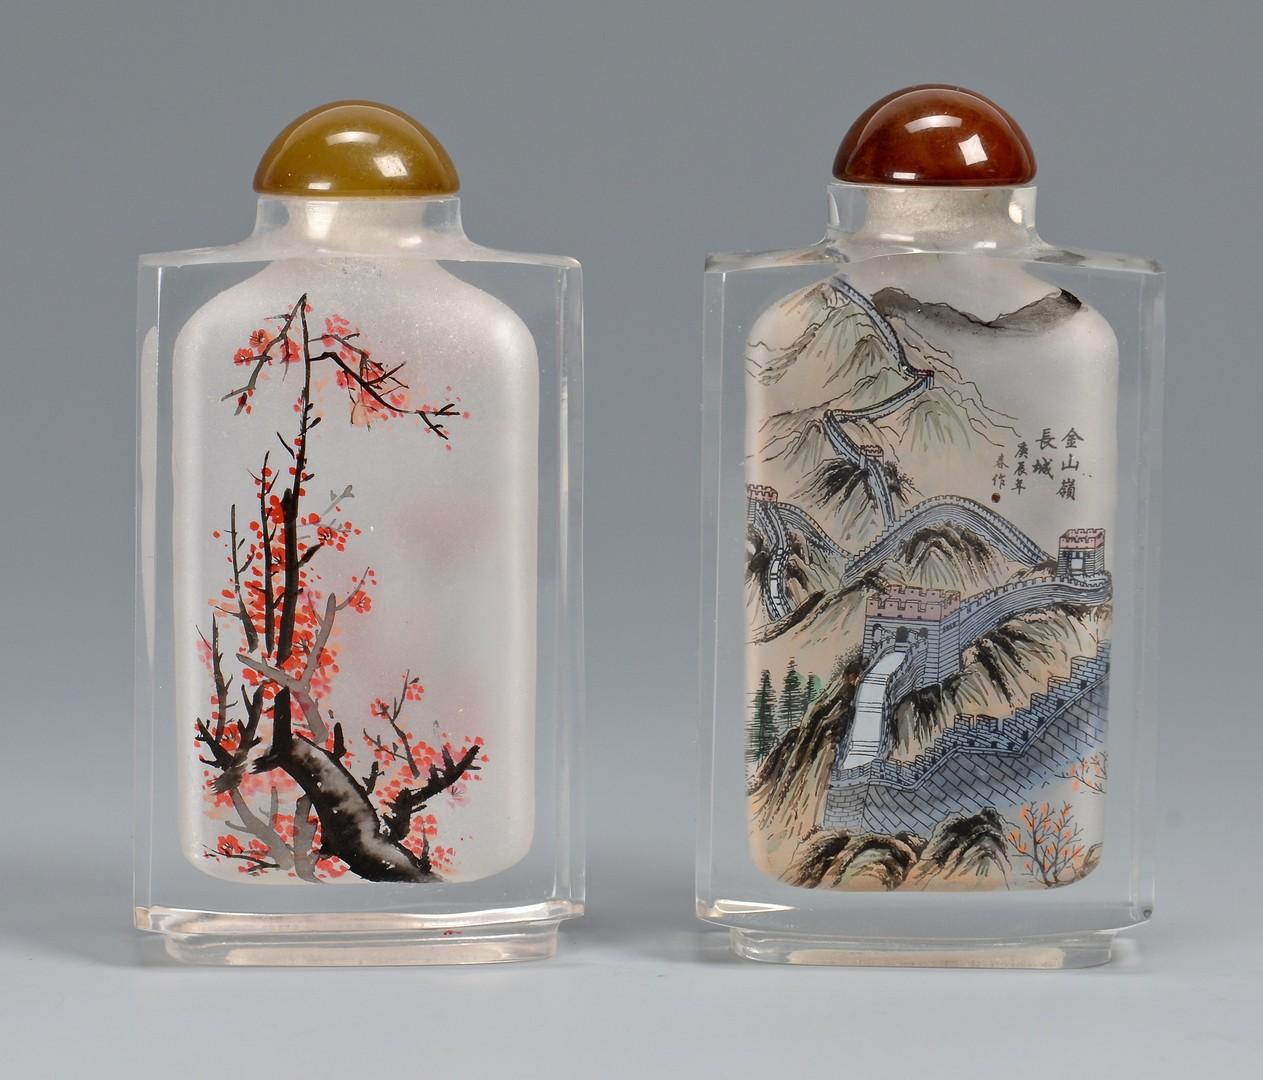 Lot 366: Pr. Chinese Mille Fleur Miniature Vases & Pr. Snuff Bottles